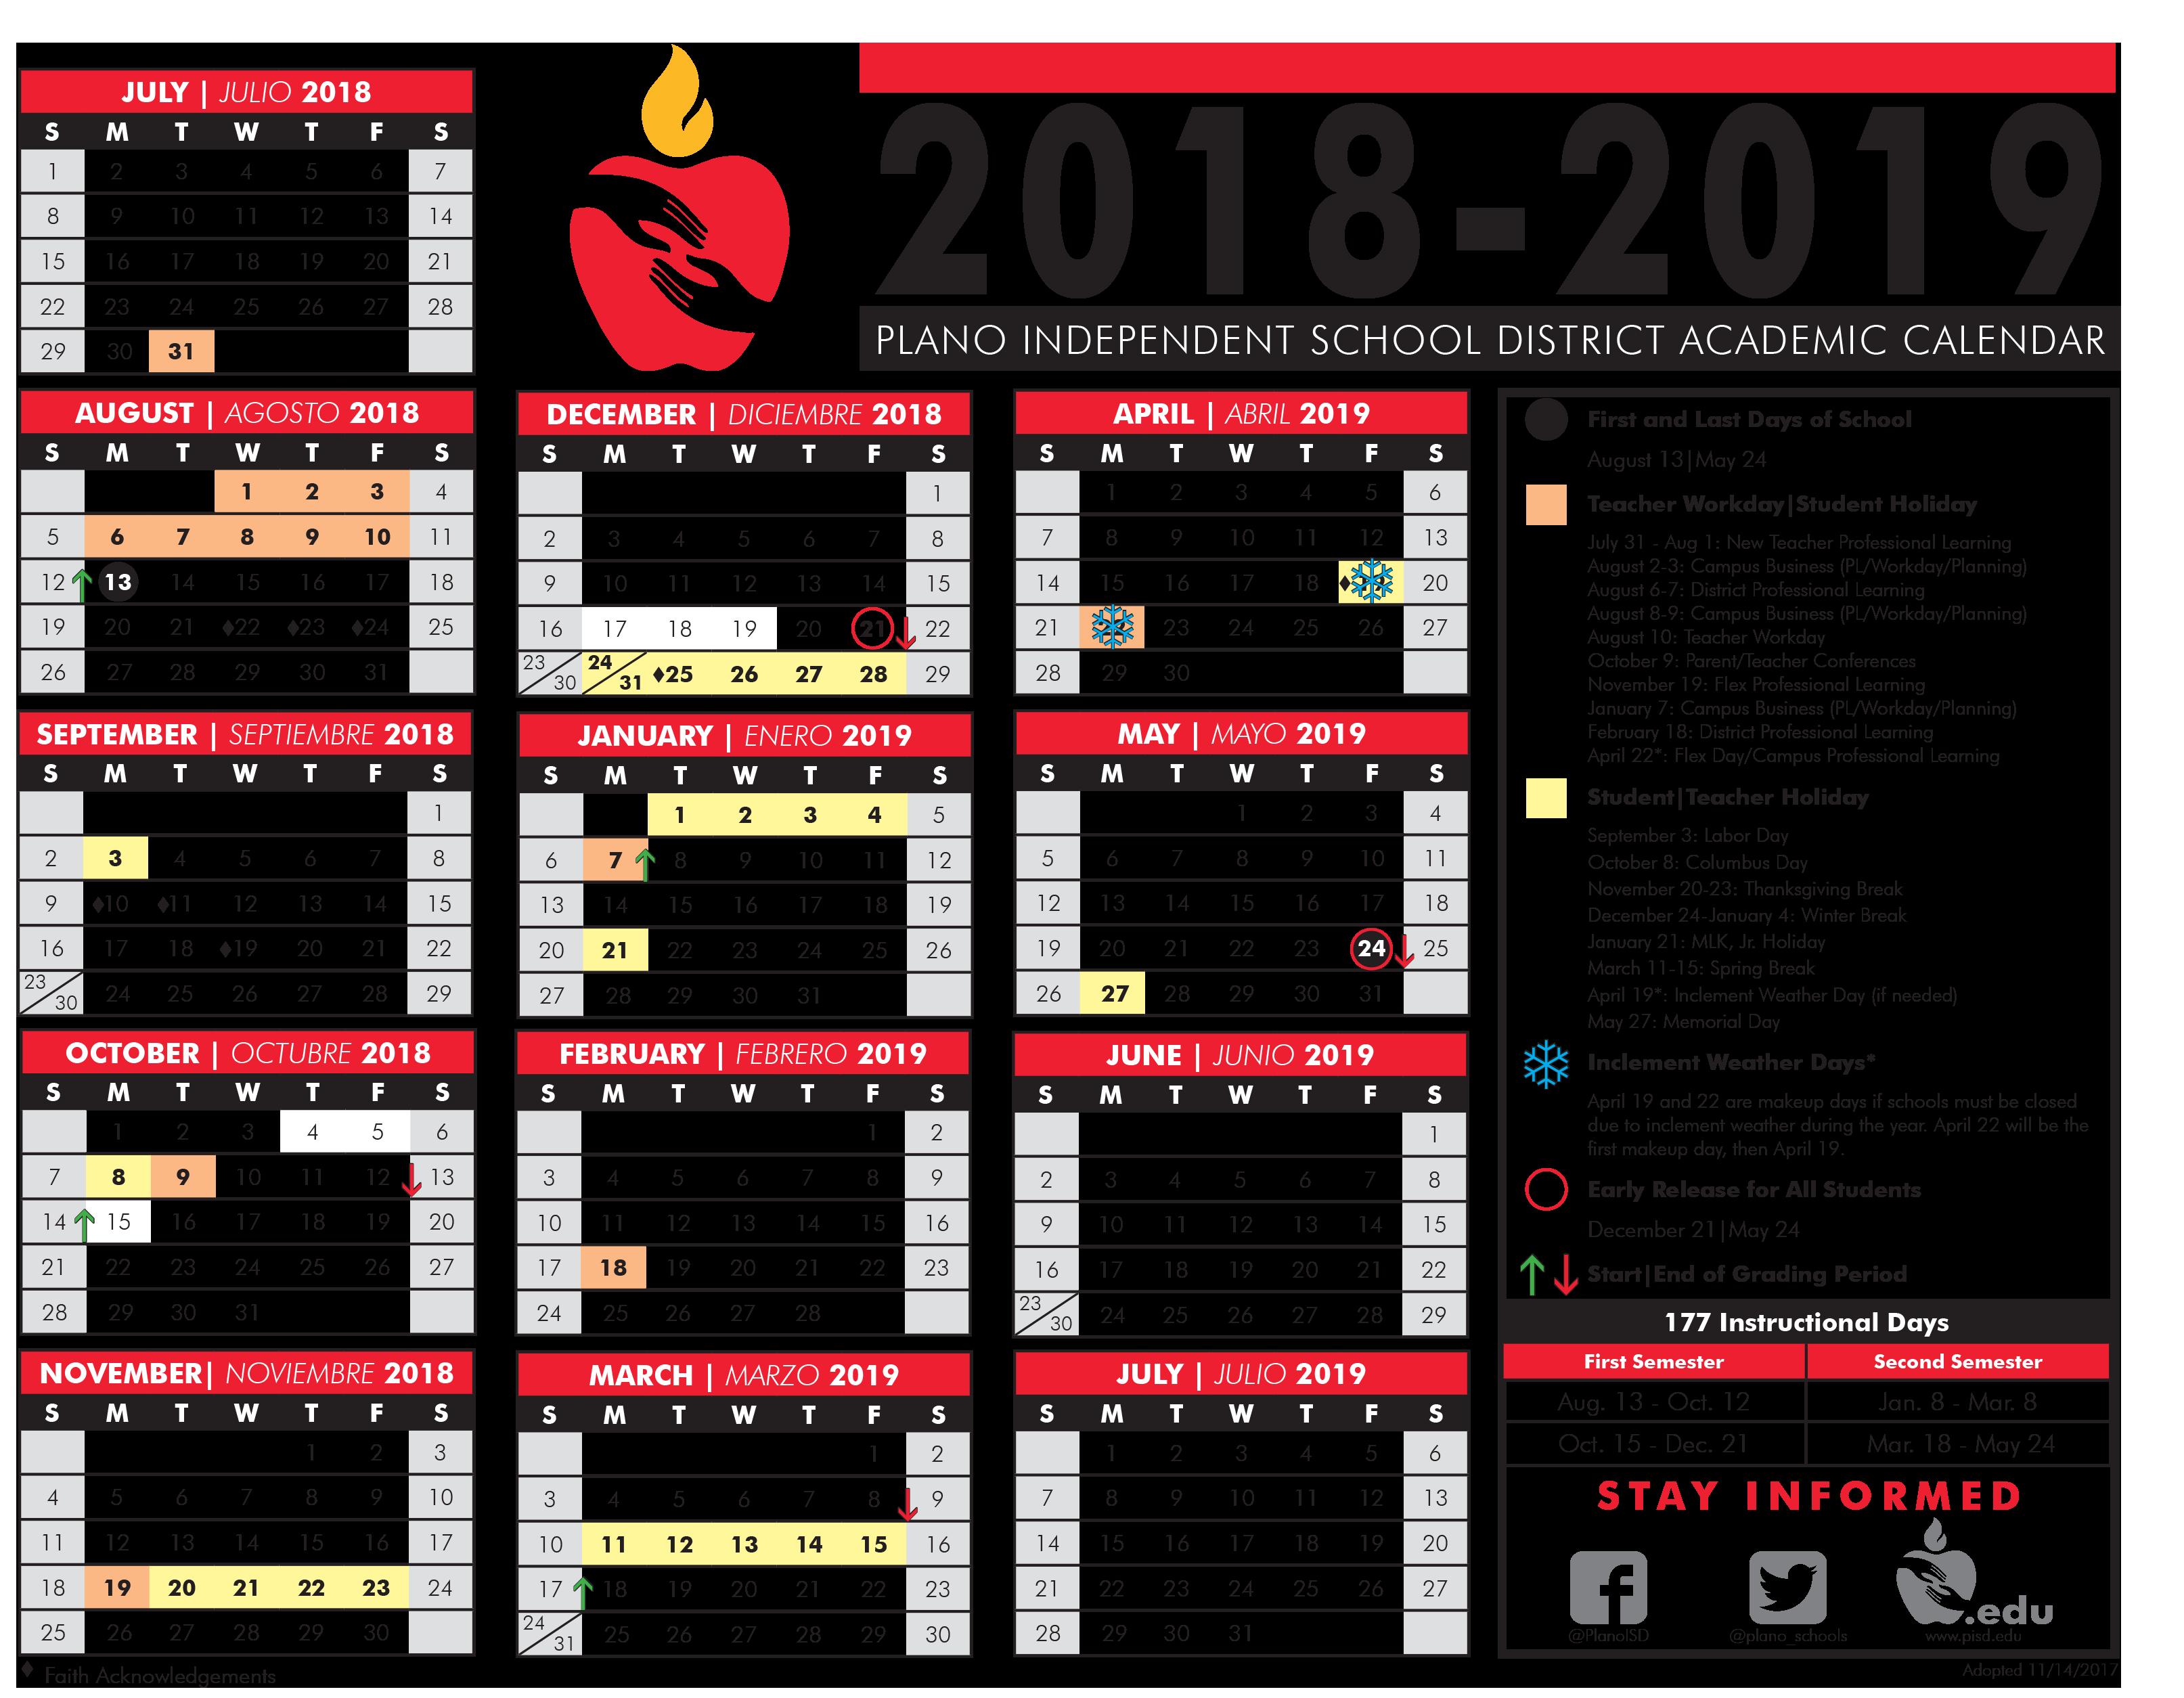 Pisd Calendar 2019 Plano School District ISD Calender 2018   2019   The Real McCoys